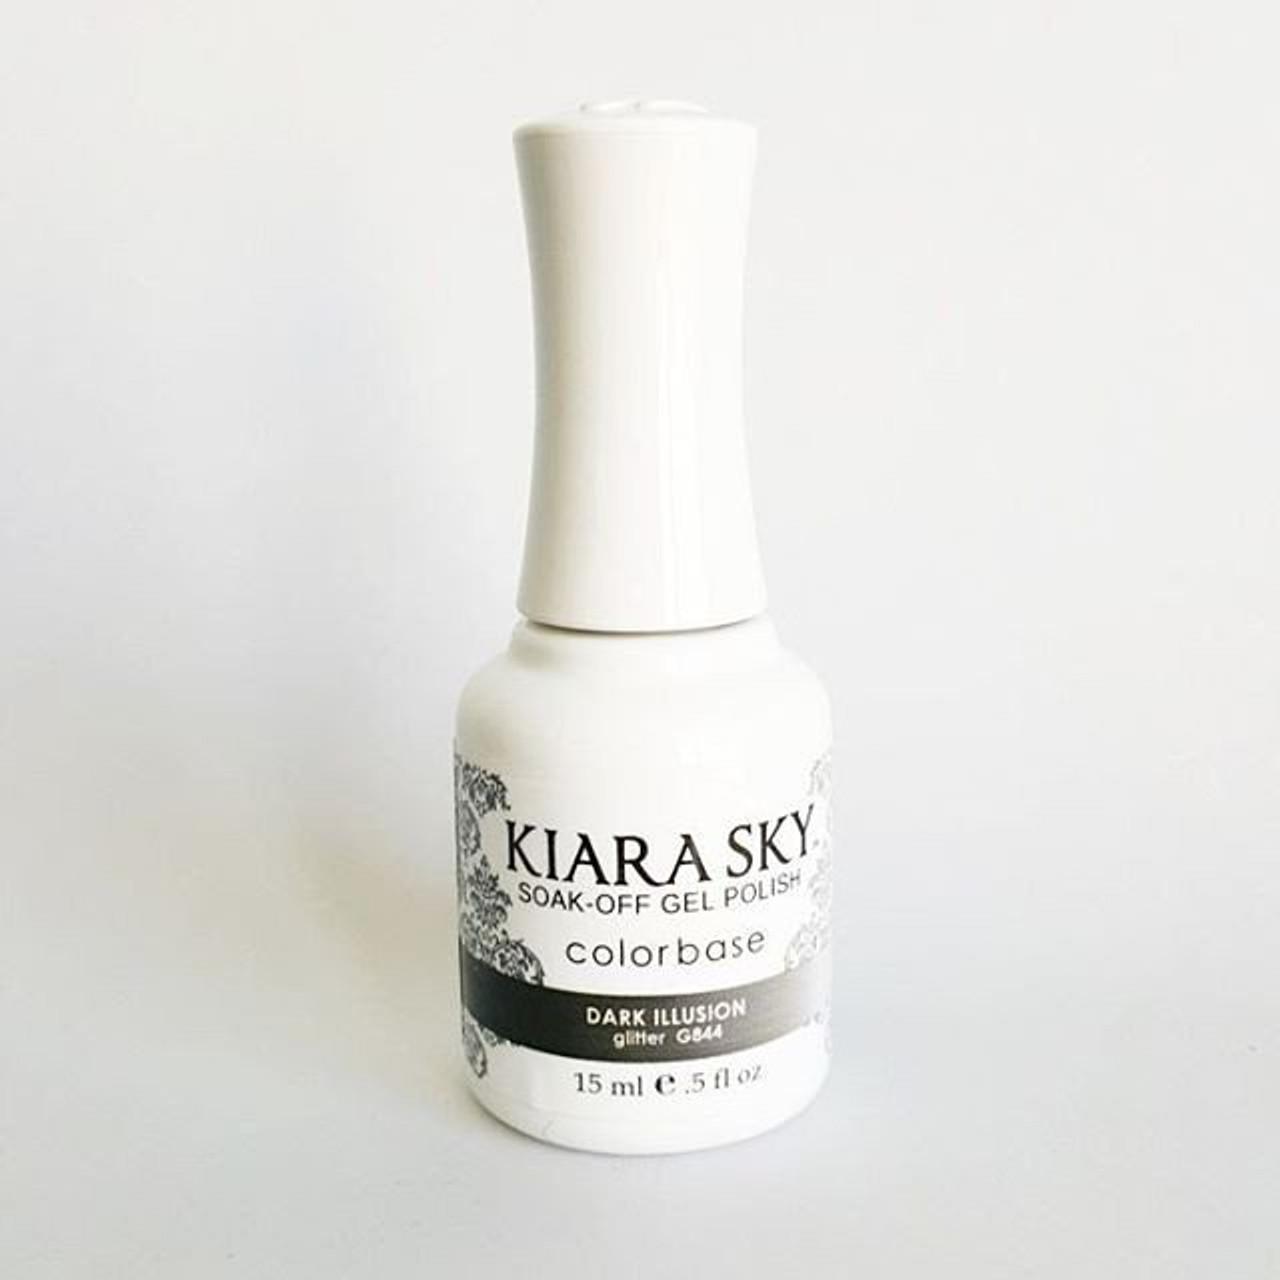 Kiara Sky Ombre Color Changing Gel Polish - G844 Dark Illusion .5oz ...